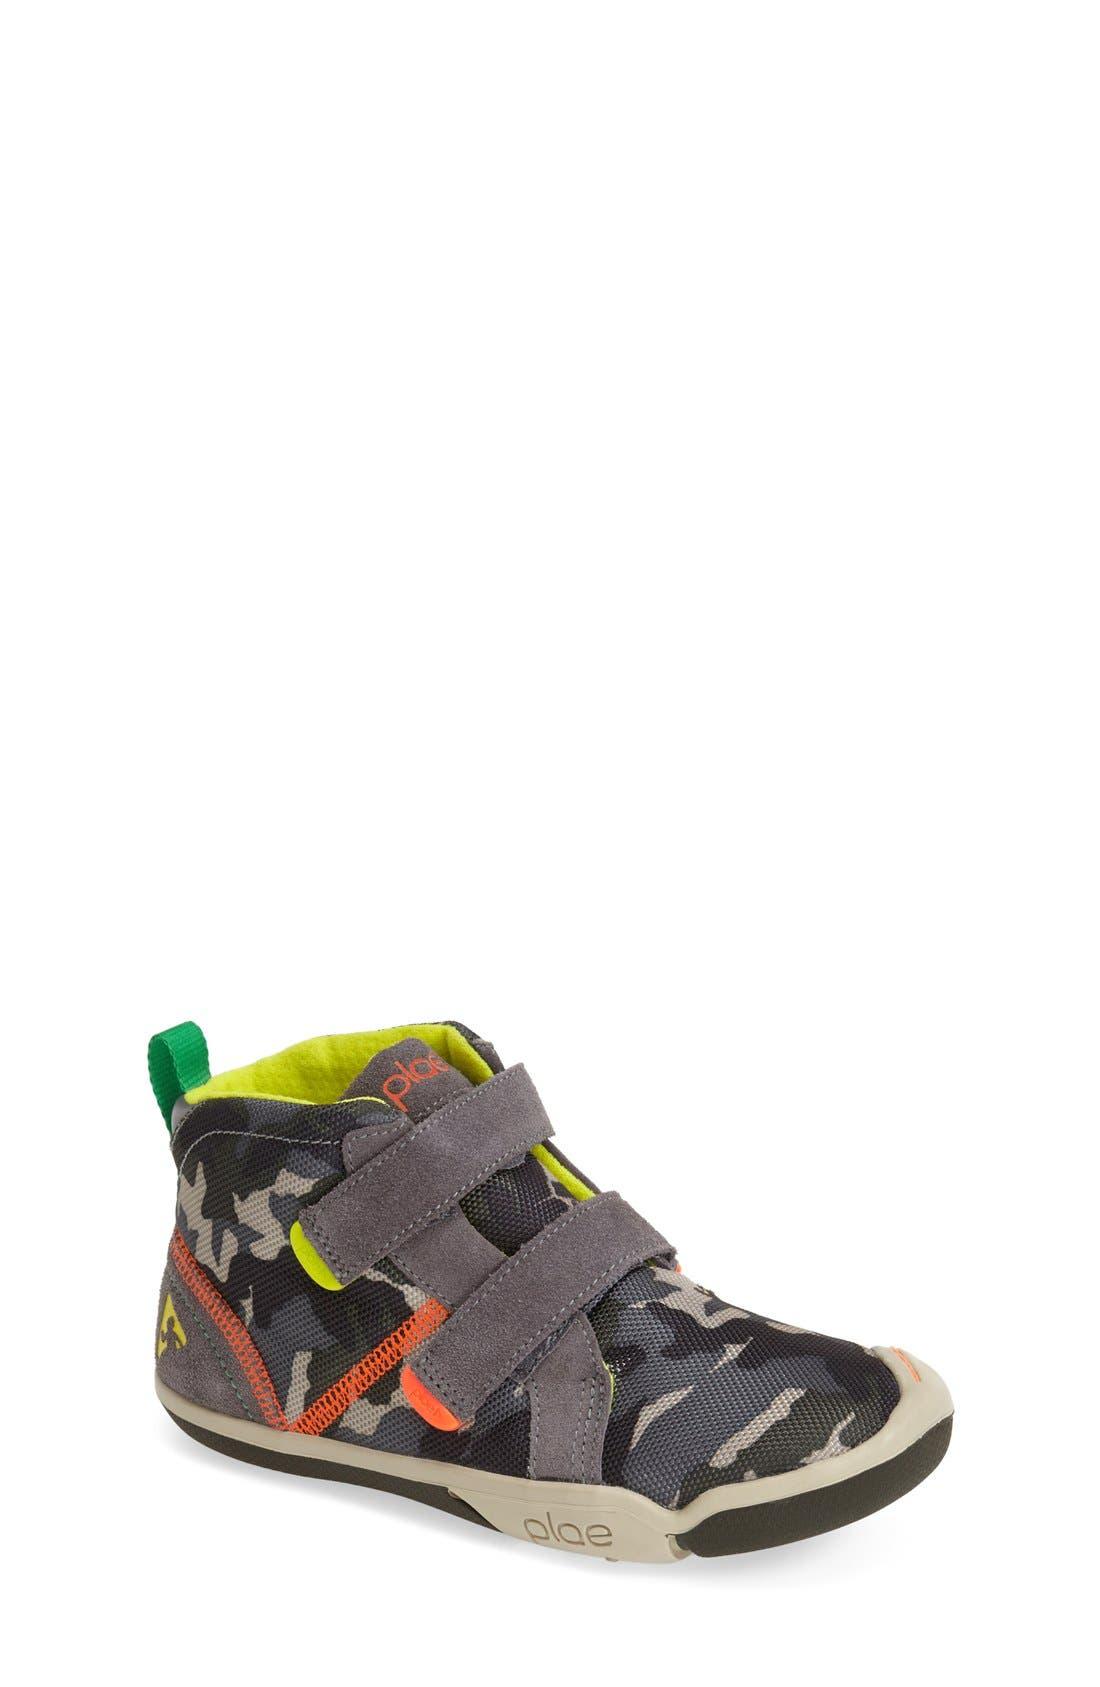 'Max' Customizable High Top Sneaker,                             Main thumbnail 1, color,                             054